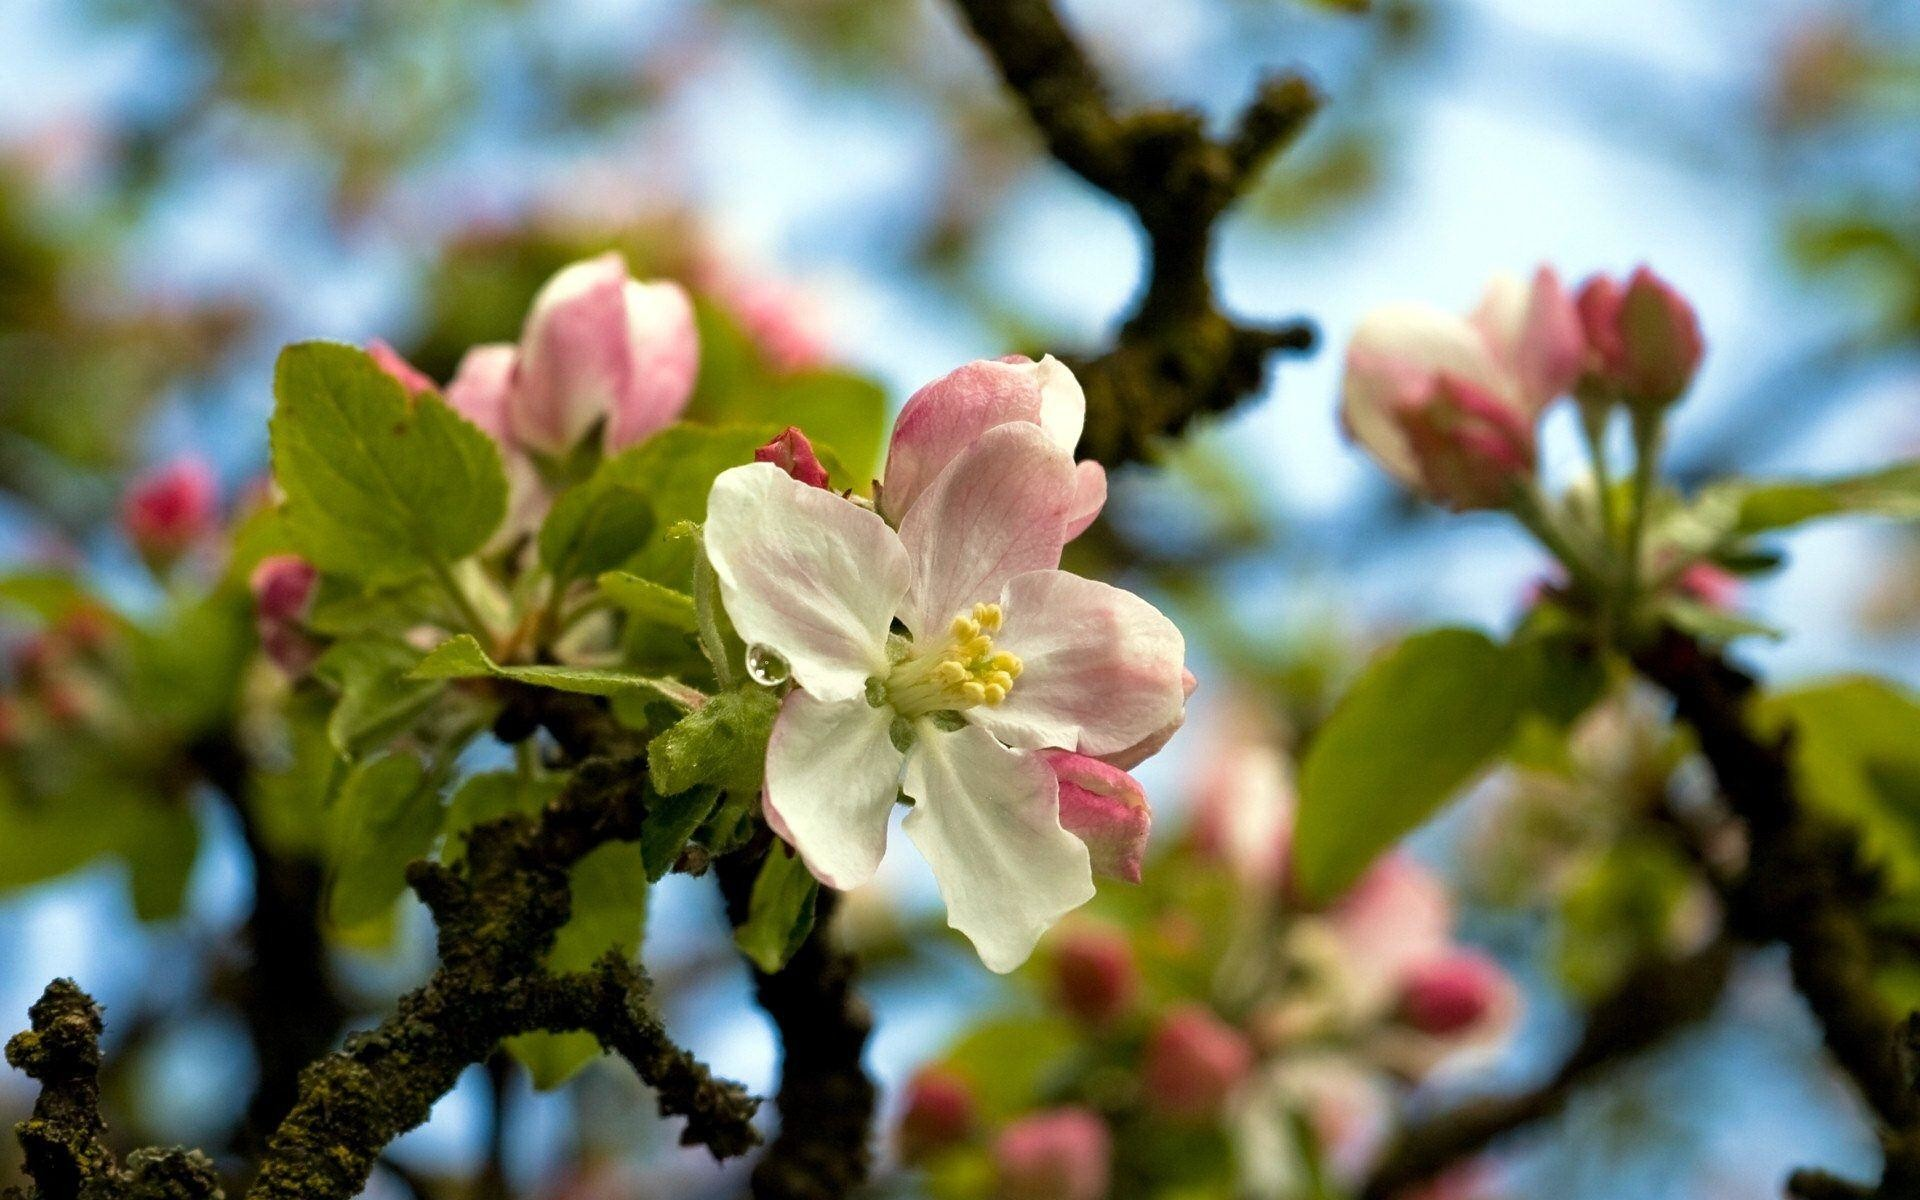 Wallpaper HD Apple Blossoms, Apple Blossom wallpaper – 1920×1200 .